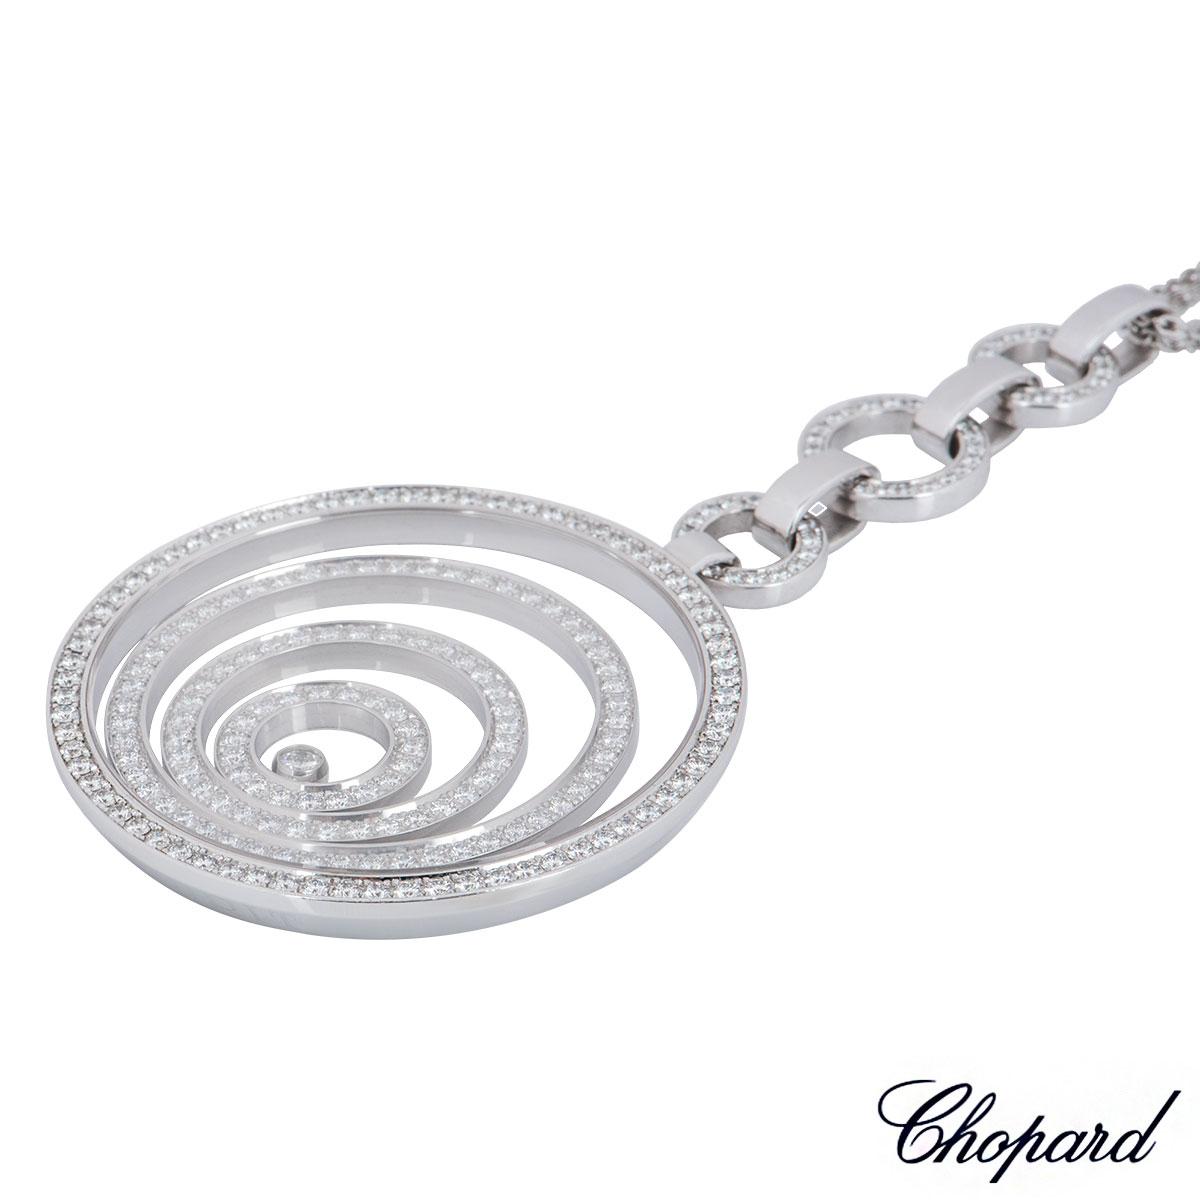 Chopard White Gold Diamond Happy Spirit Necklace 796135-1001